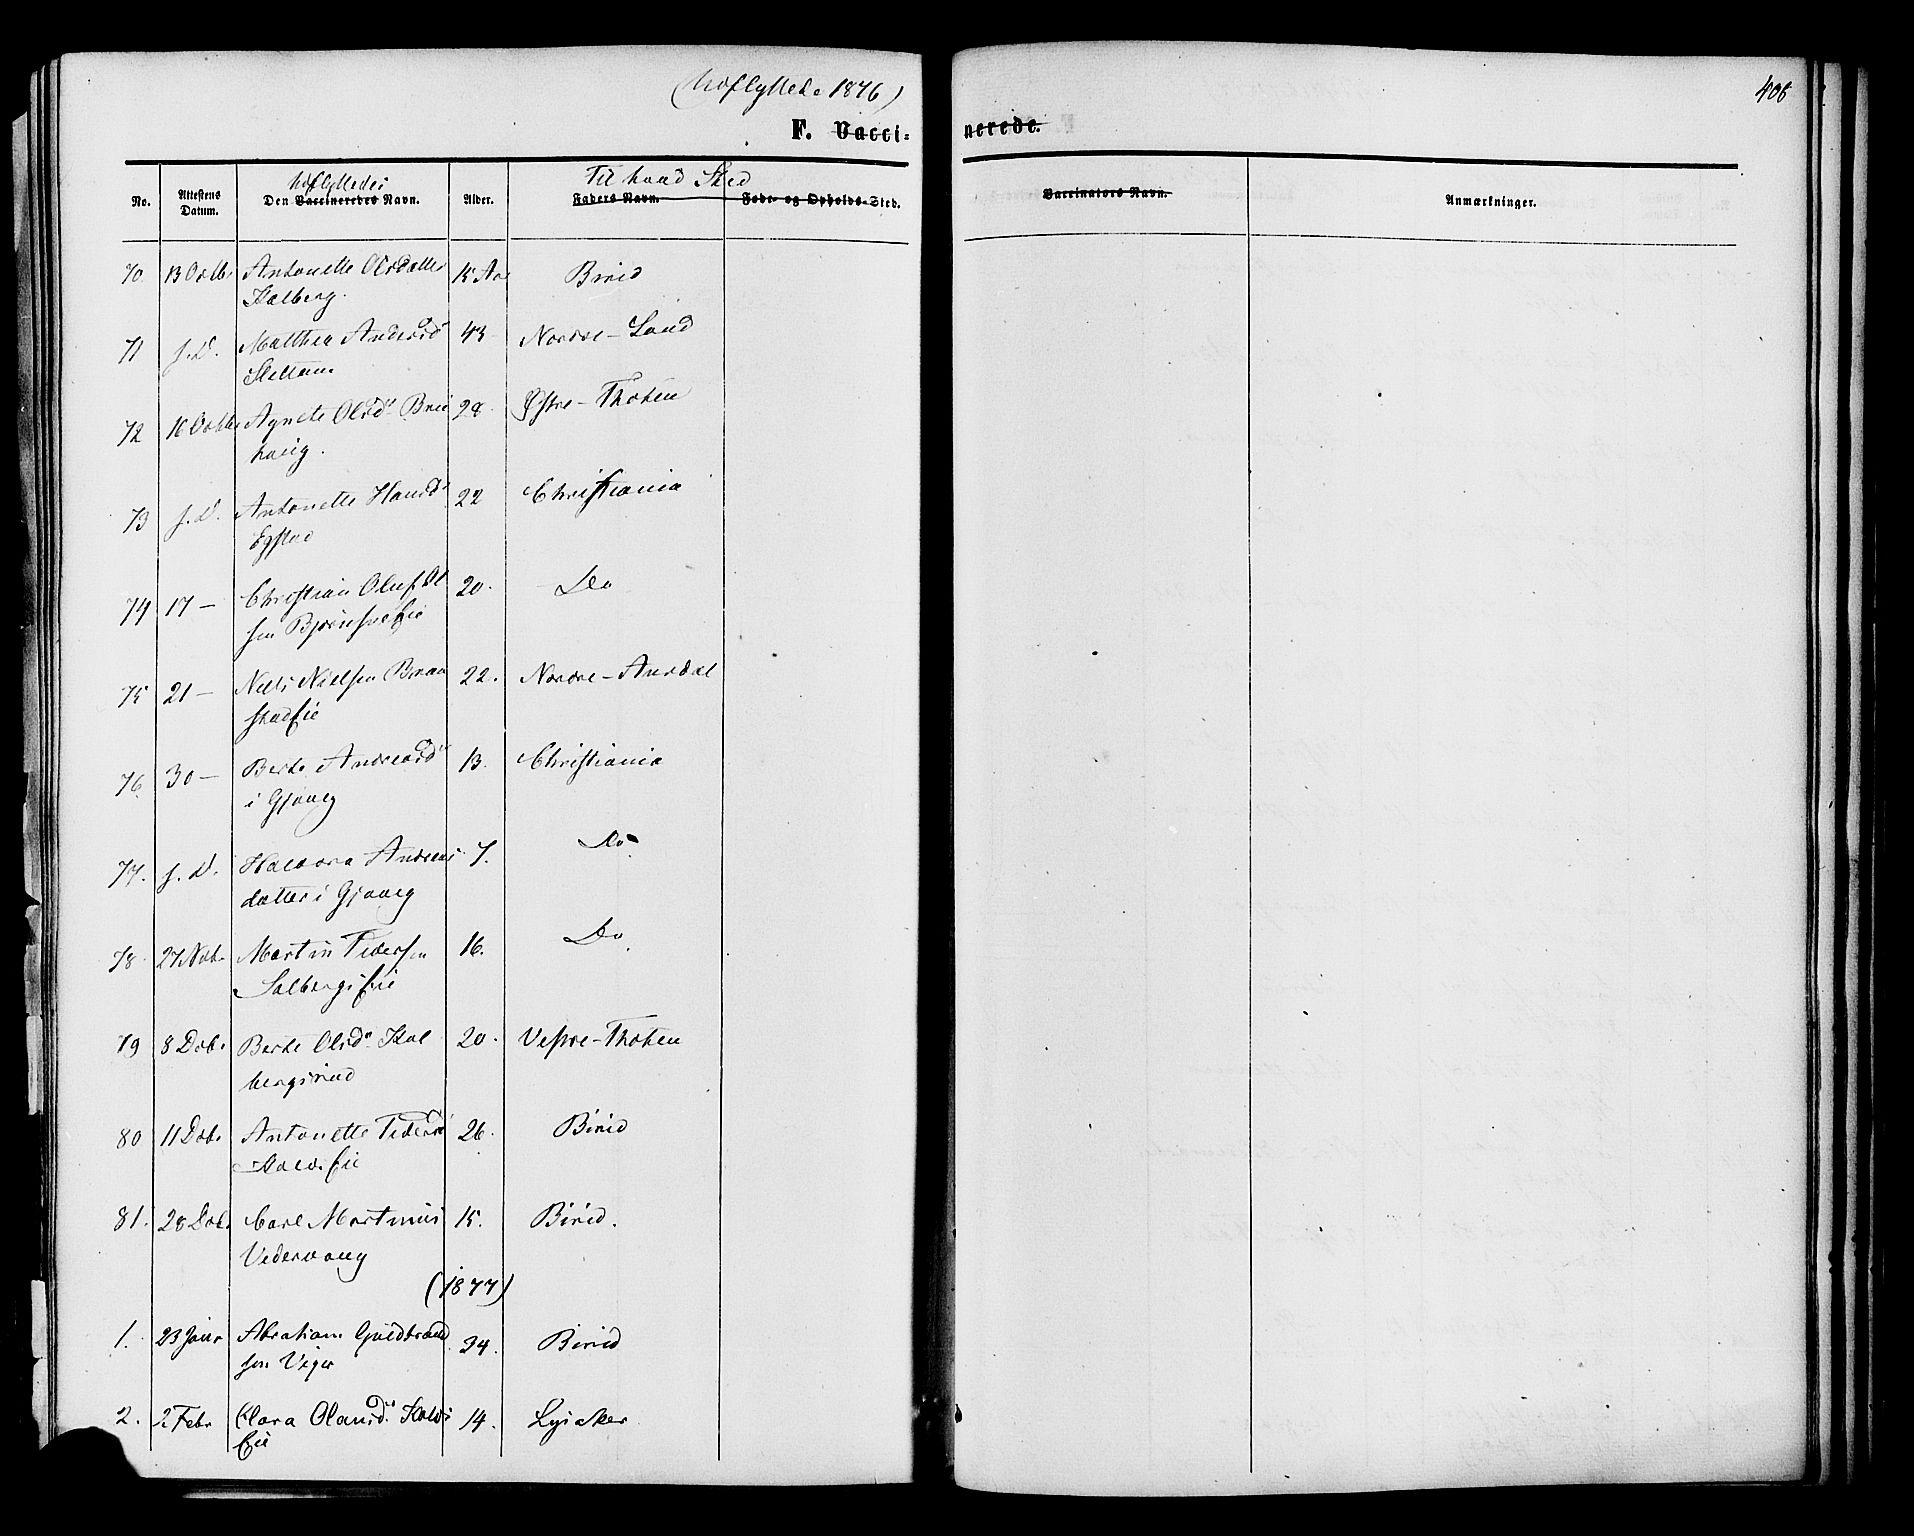 SAH, Vardal prestekontor, H/Ha/Haa/L0007: Ministerialbok nr. 7, 1867-1878, s. 408